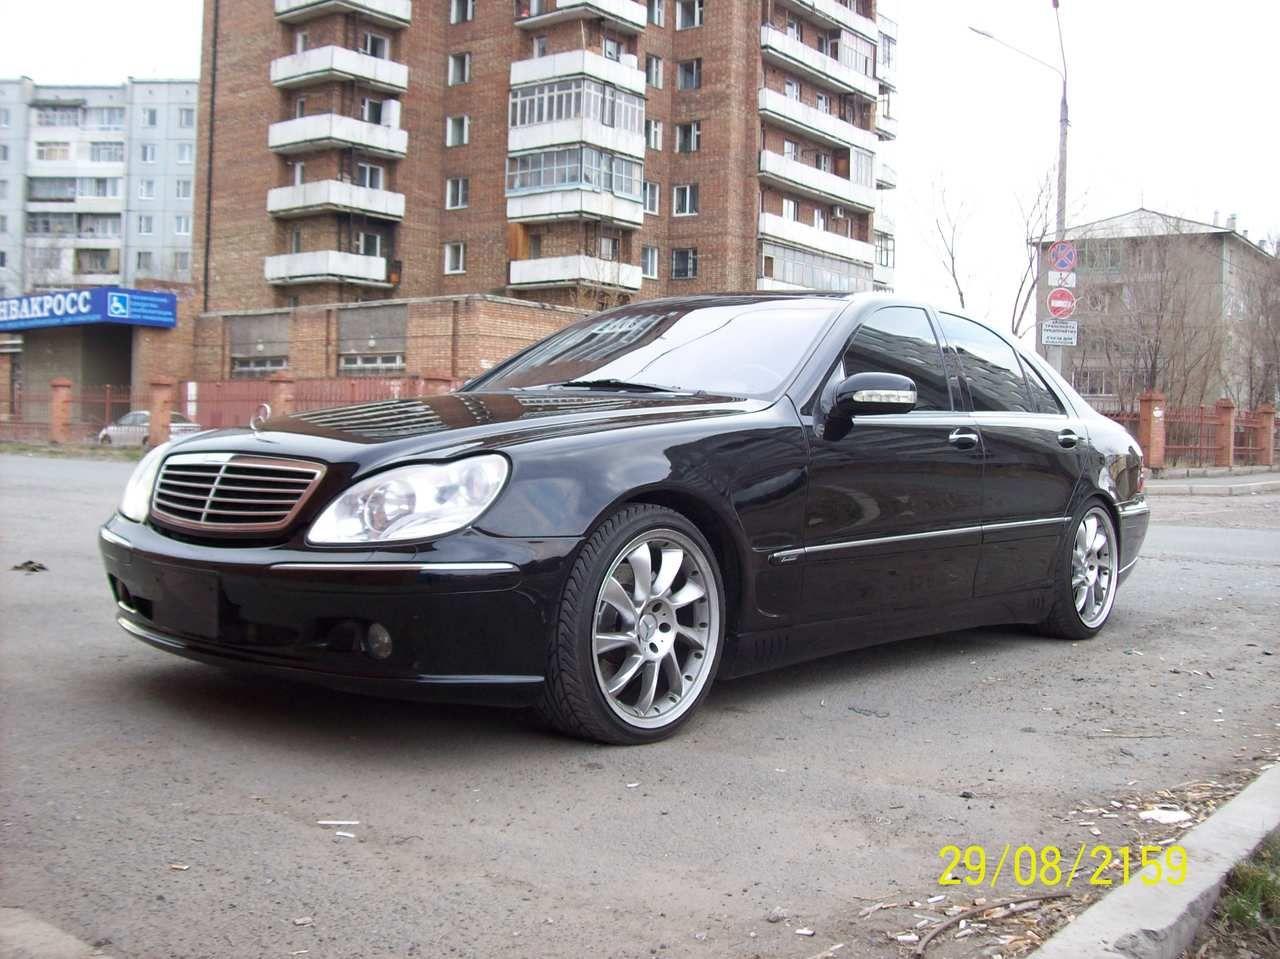 2003 Mercedes Benz S Class (W220) Benz s class, Benz s, Benz